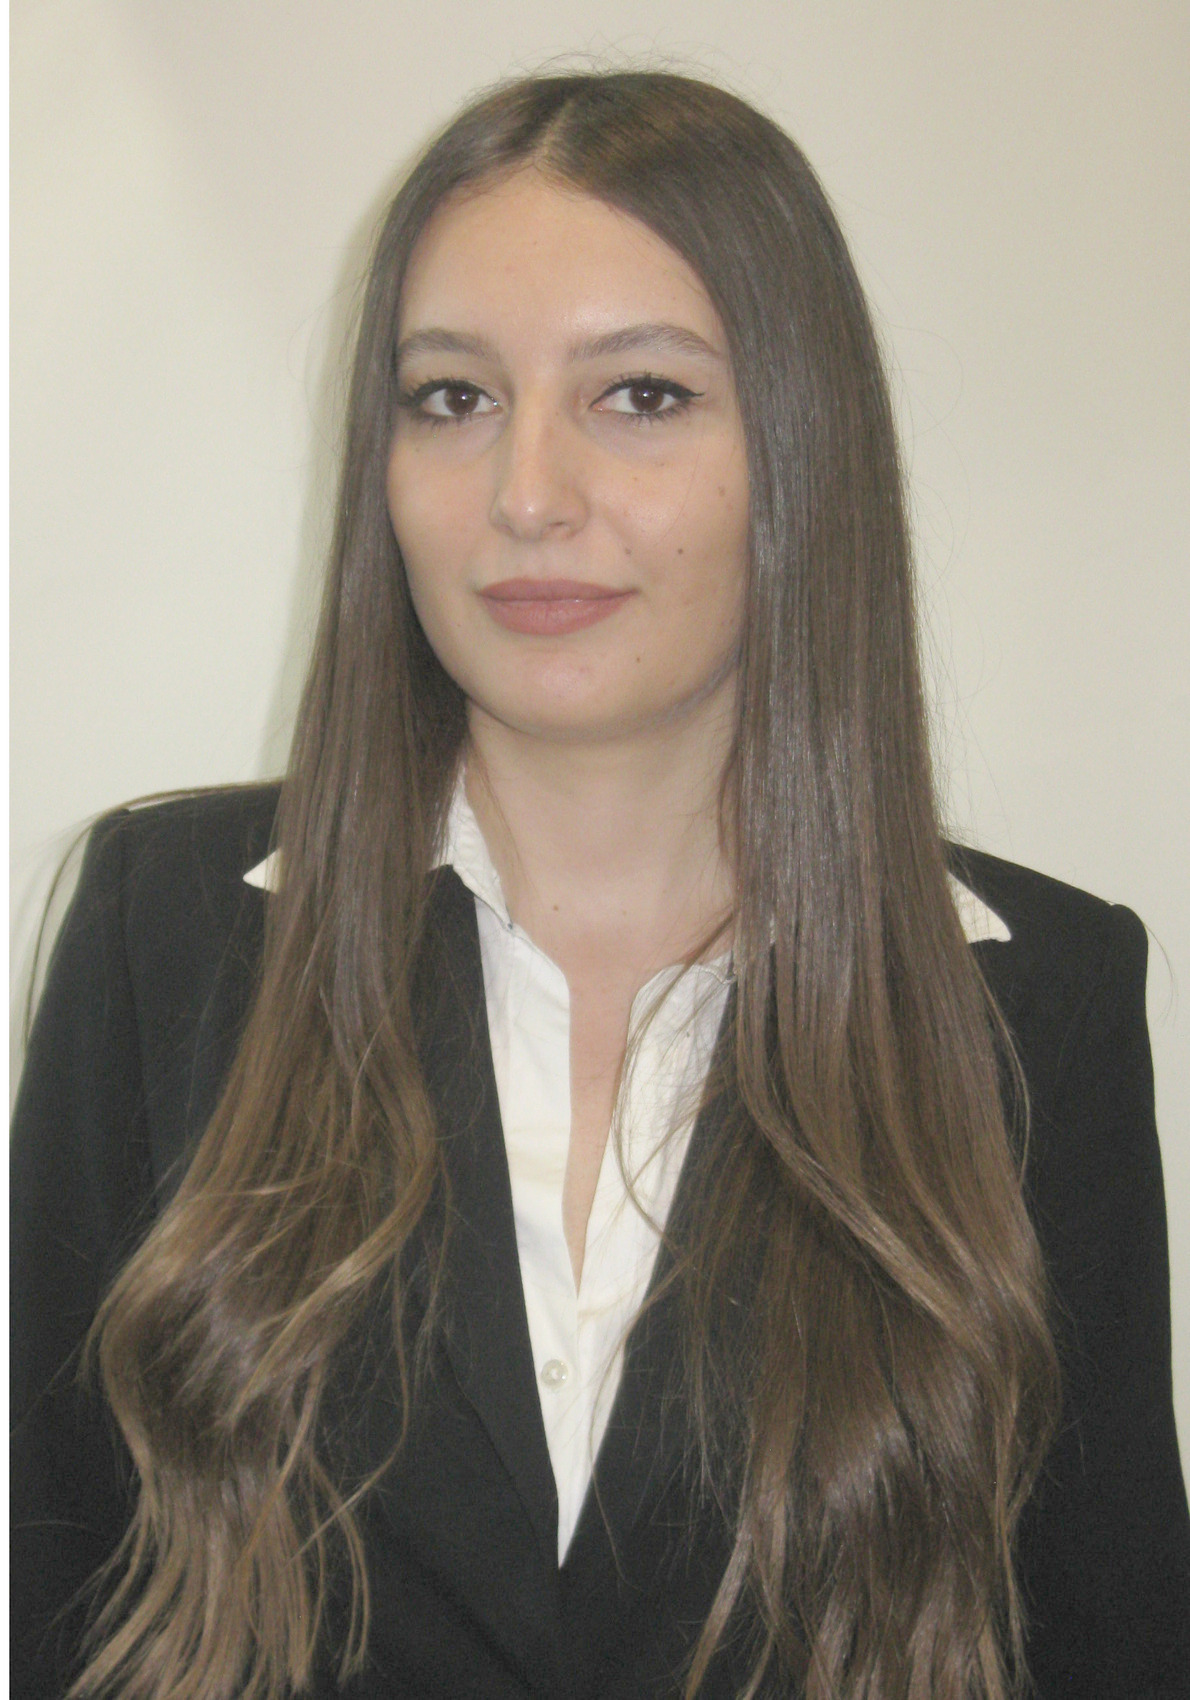 Nicole Leshcov